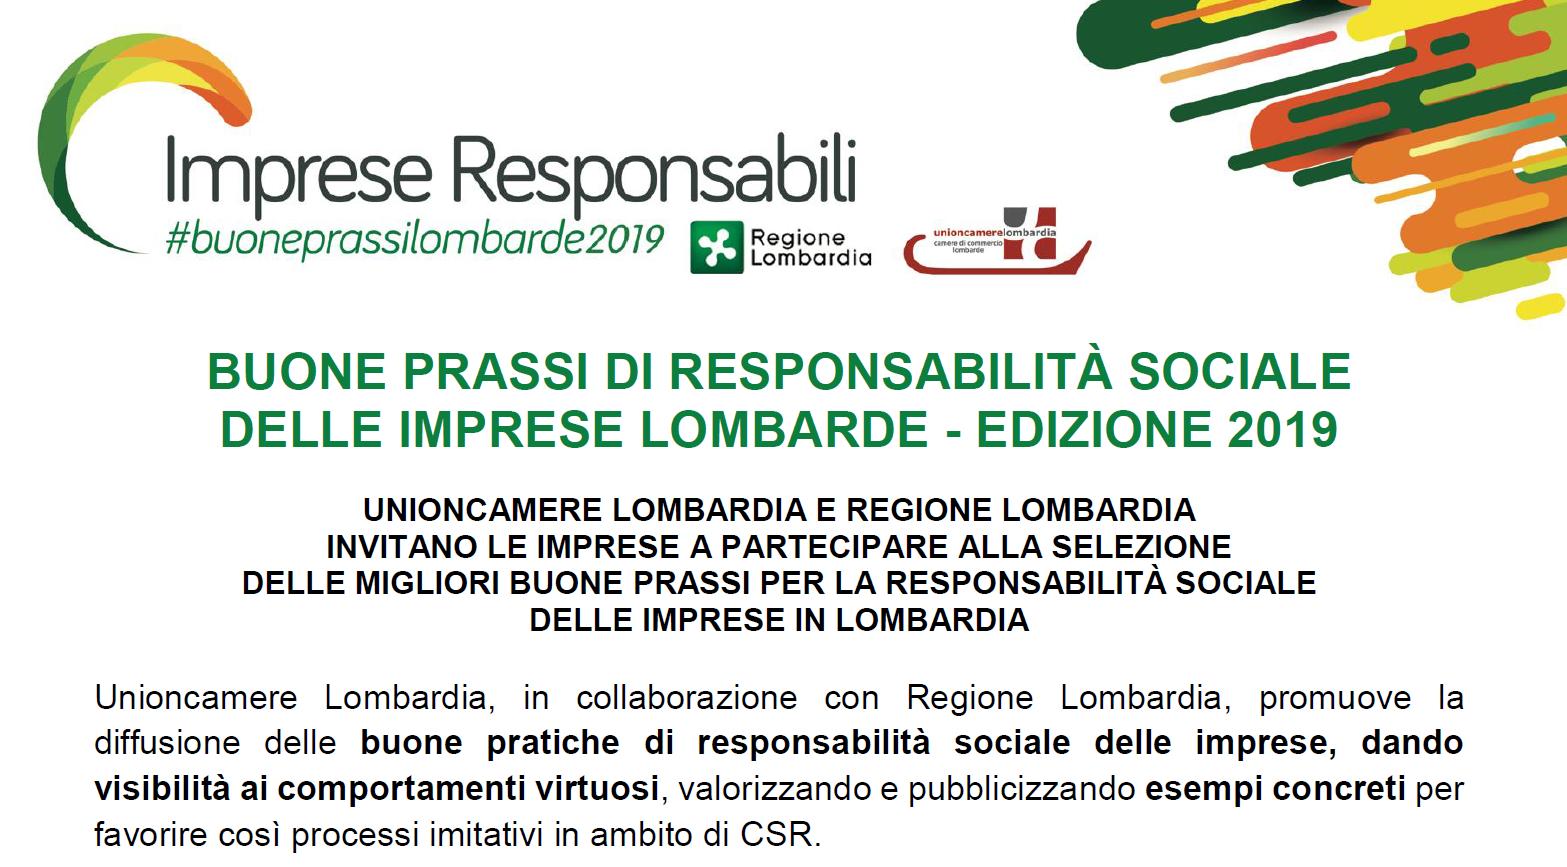 IMPRESE RESPONSABILI #buoneprassilombarde2019